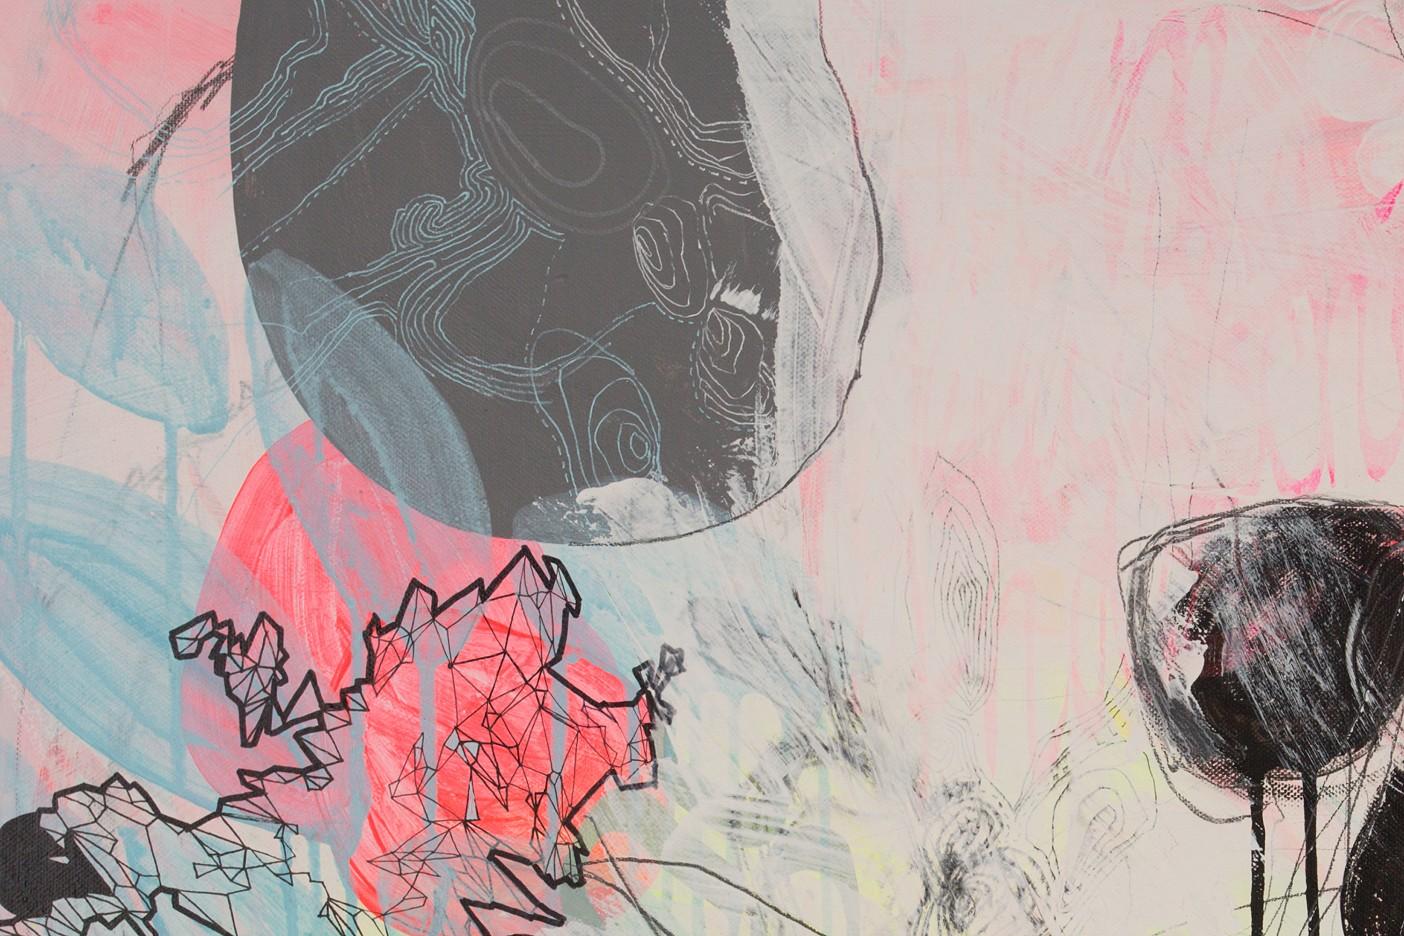 Layers drawing #2.3